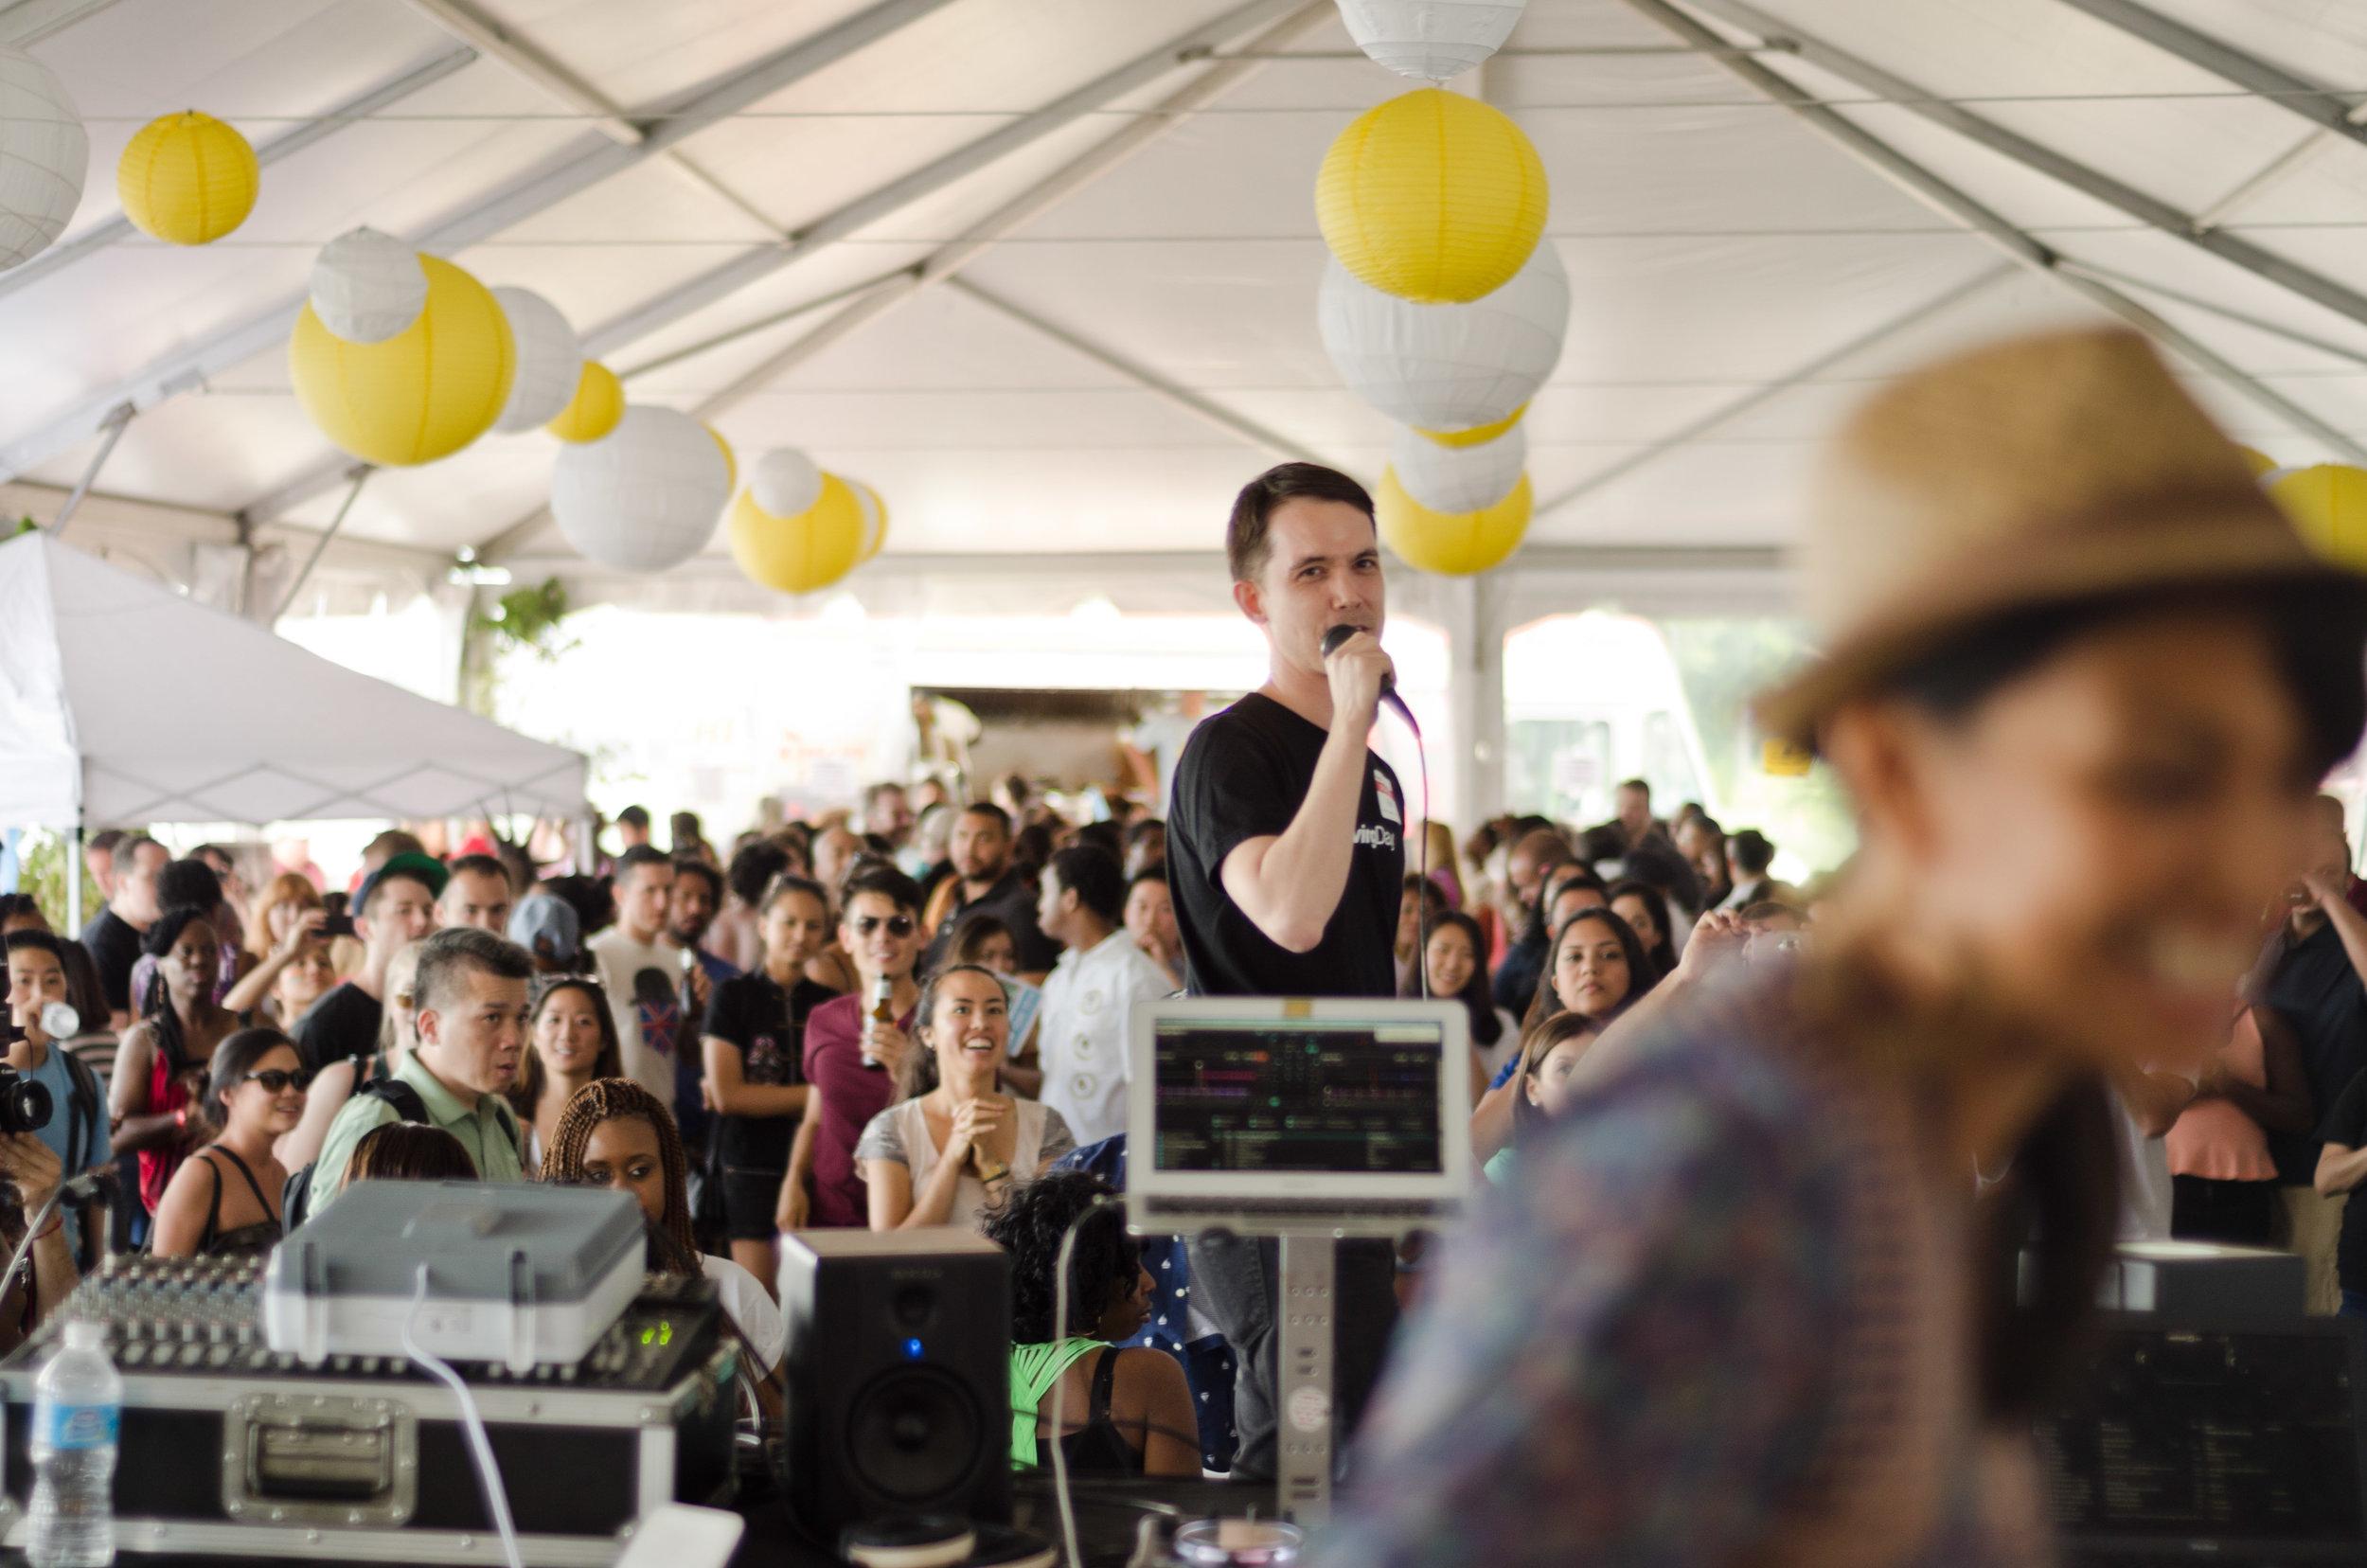 *Photo of founder Ken Tanabe at a Loving Day celebration by Shawna Enyart